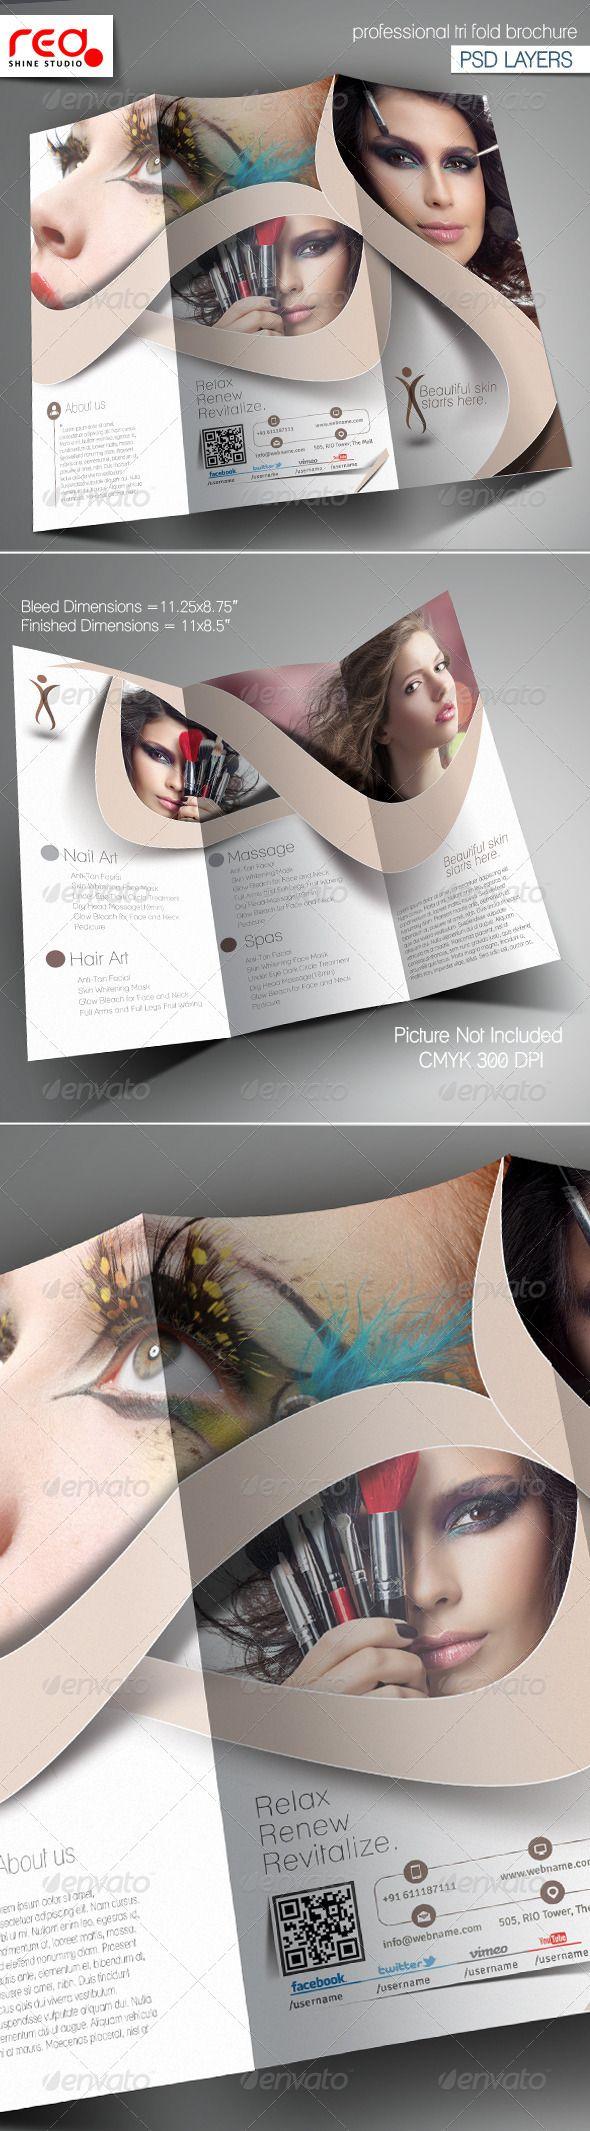 Beauty Salon Trifold Brochure Template